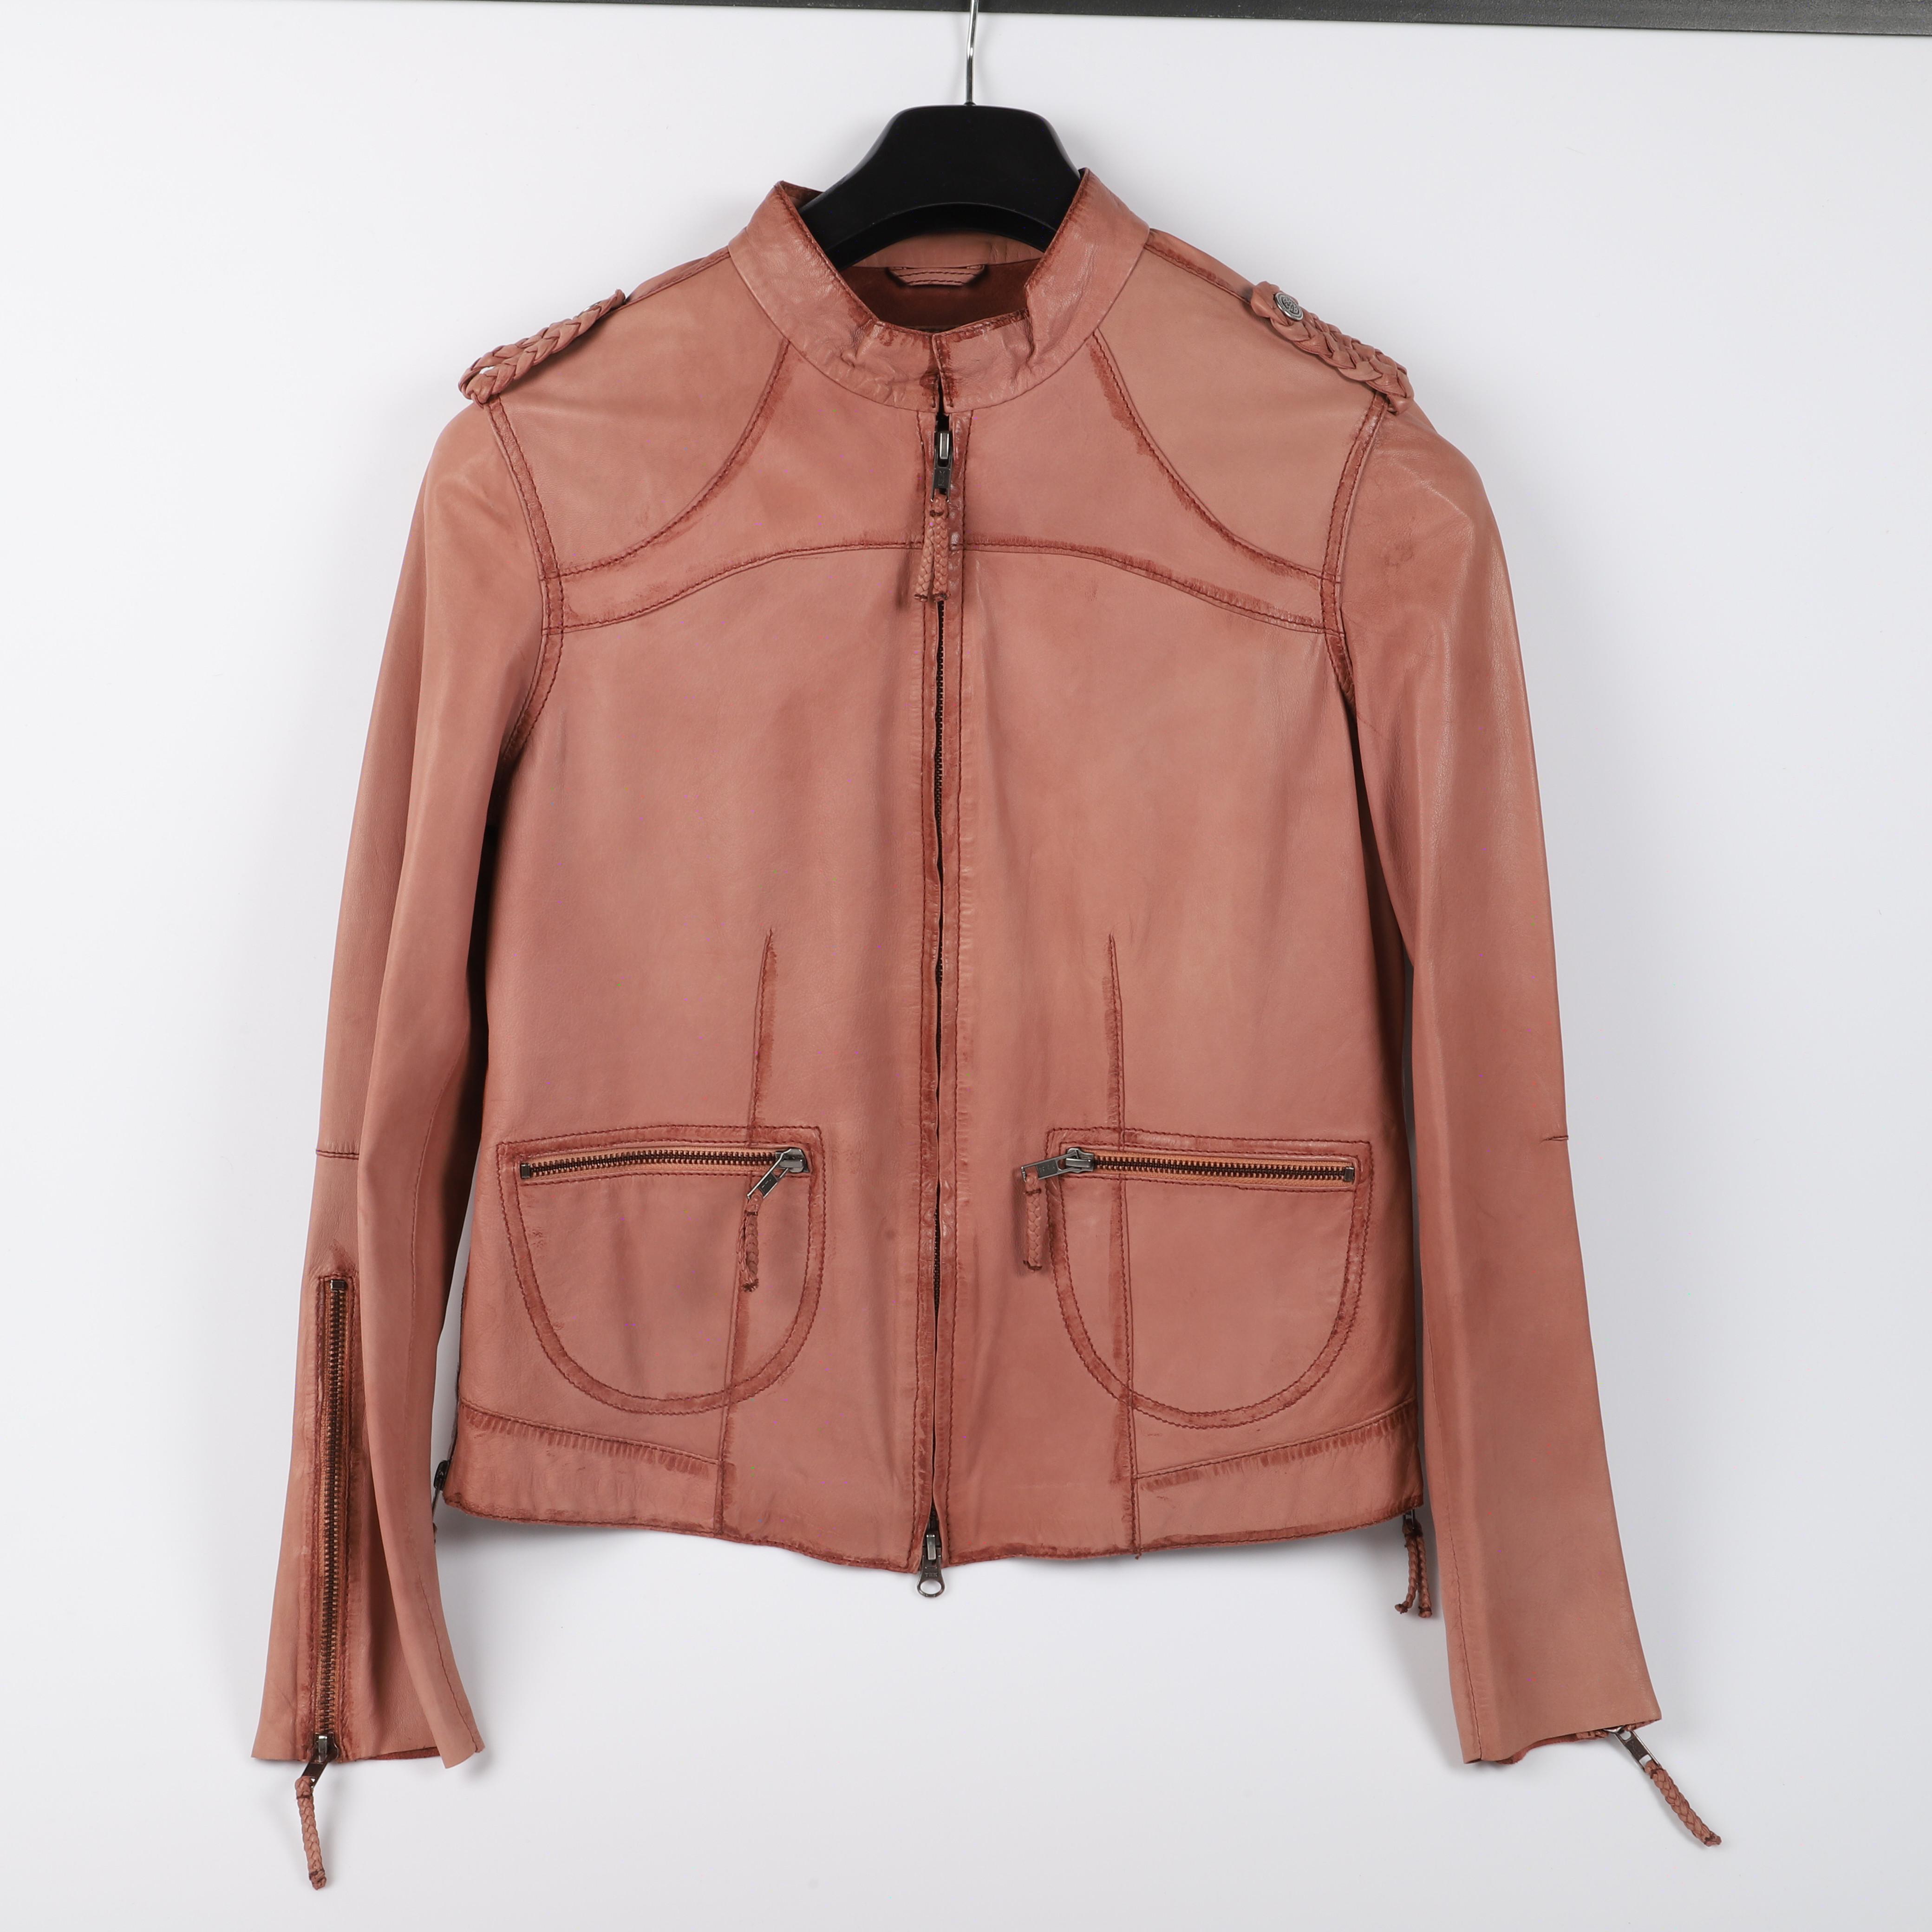 JACKA, rosa skinn, Sixty Days. Vintagekläder & Accessoarer